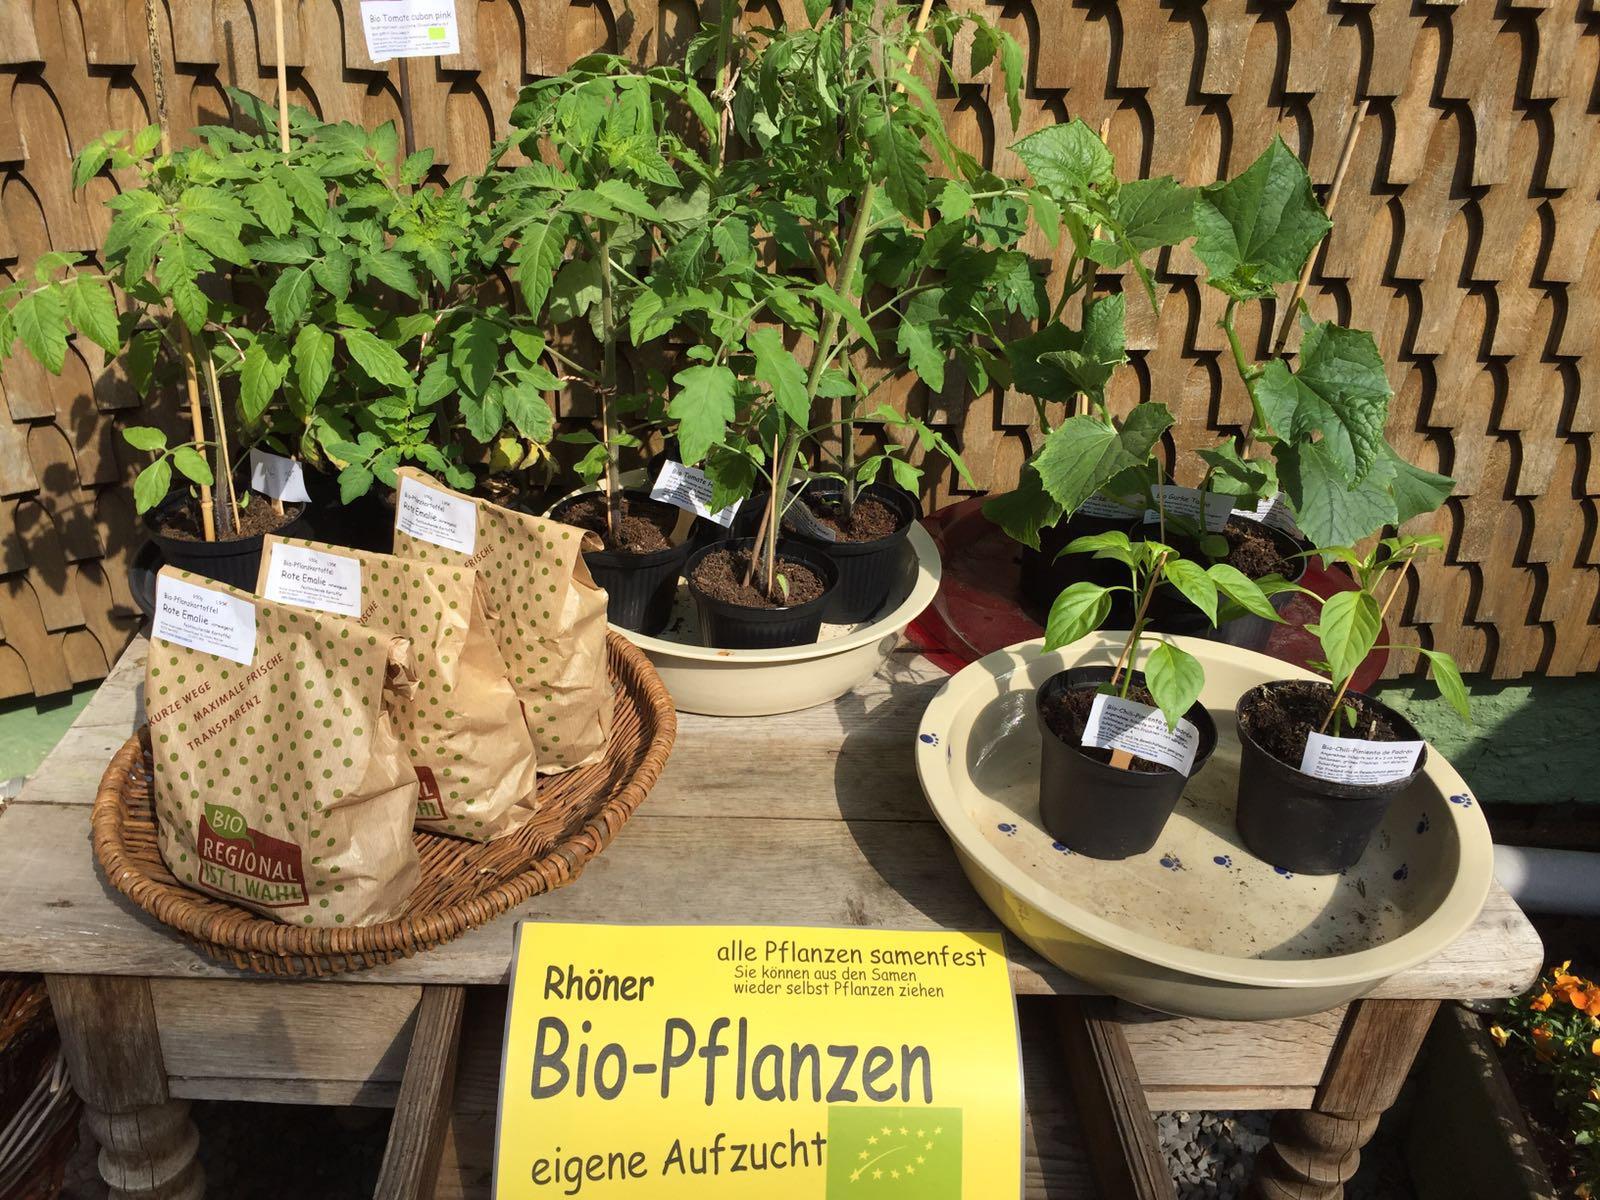 Biopflanzen